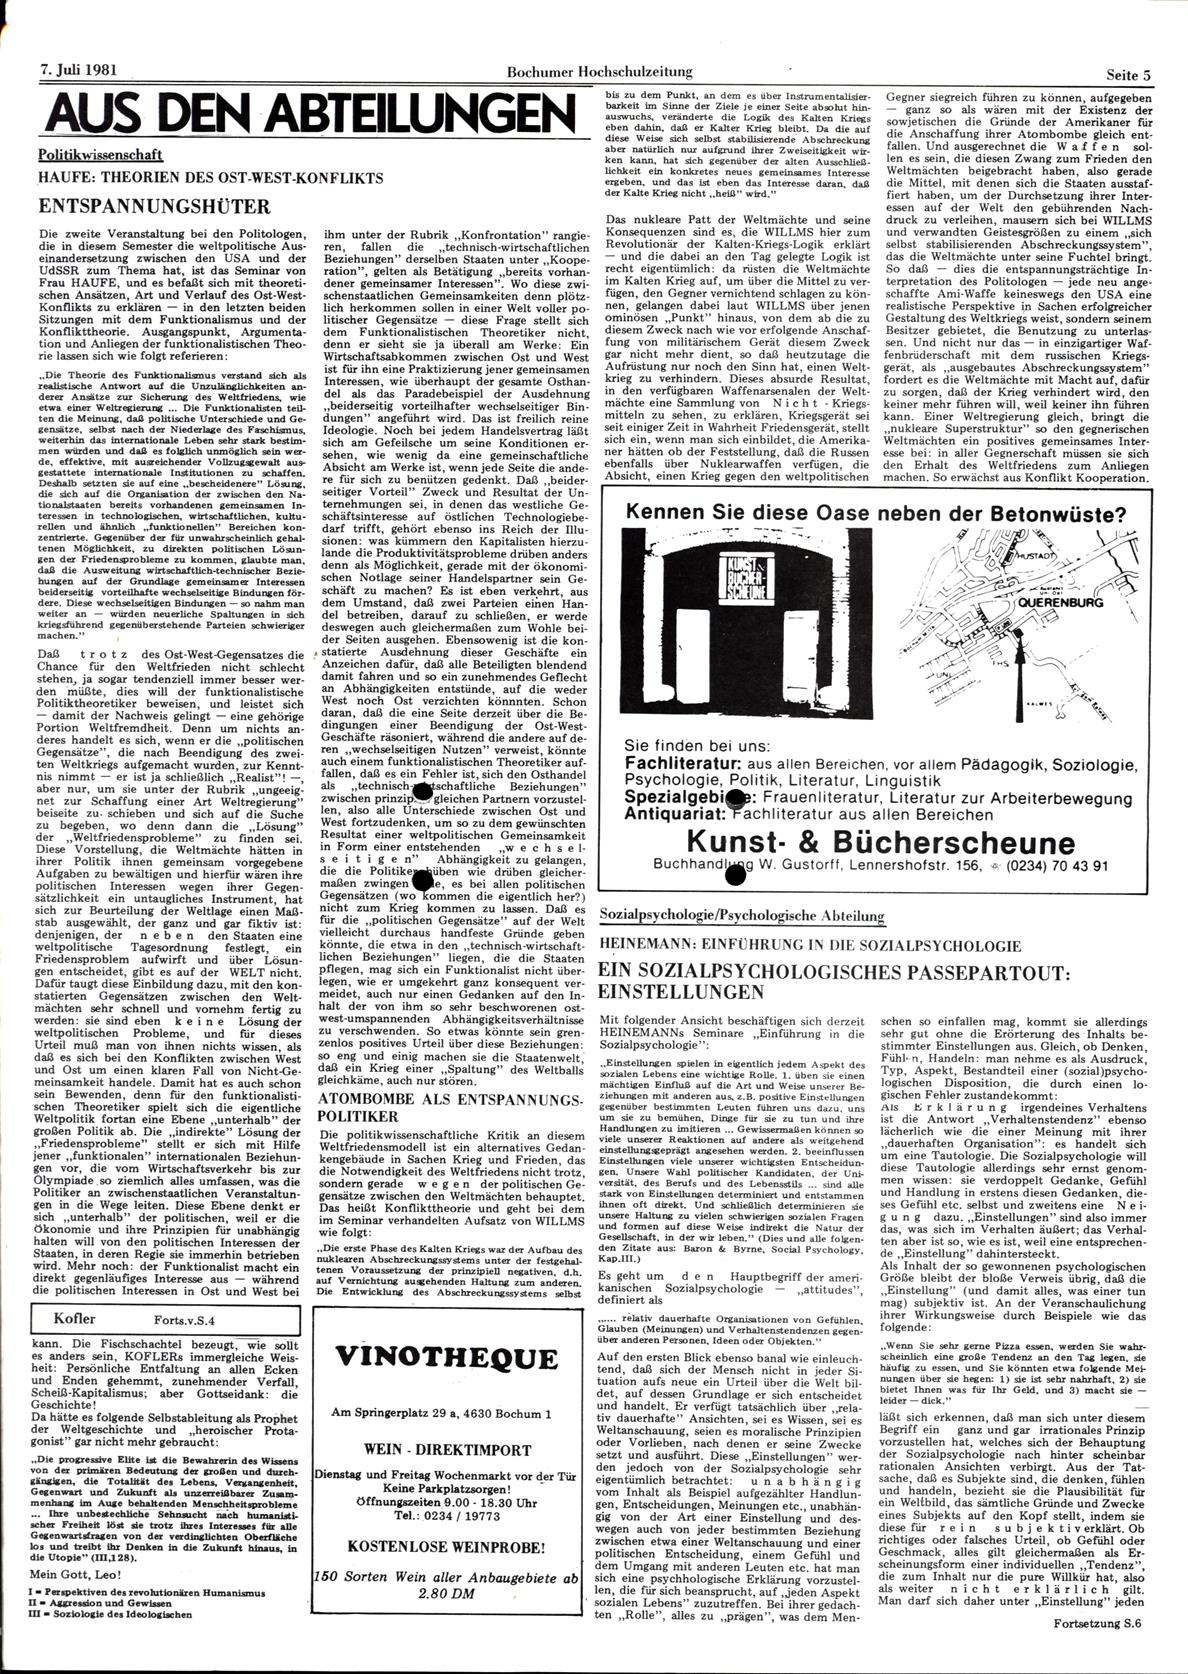 Bochum_BHZ_19810707_036_005